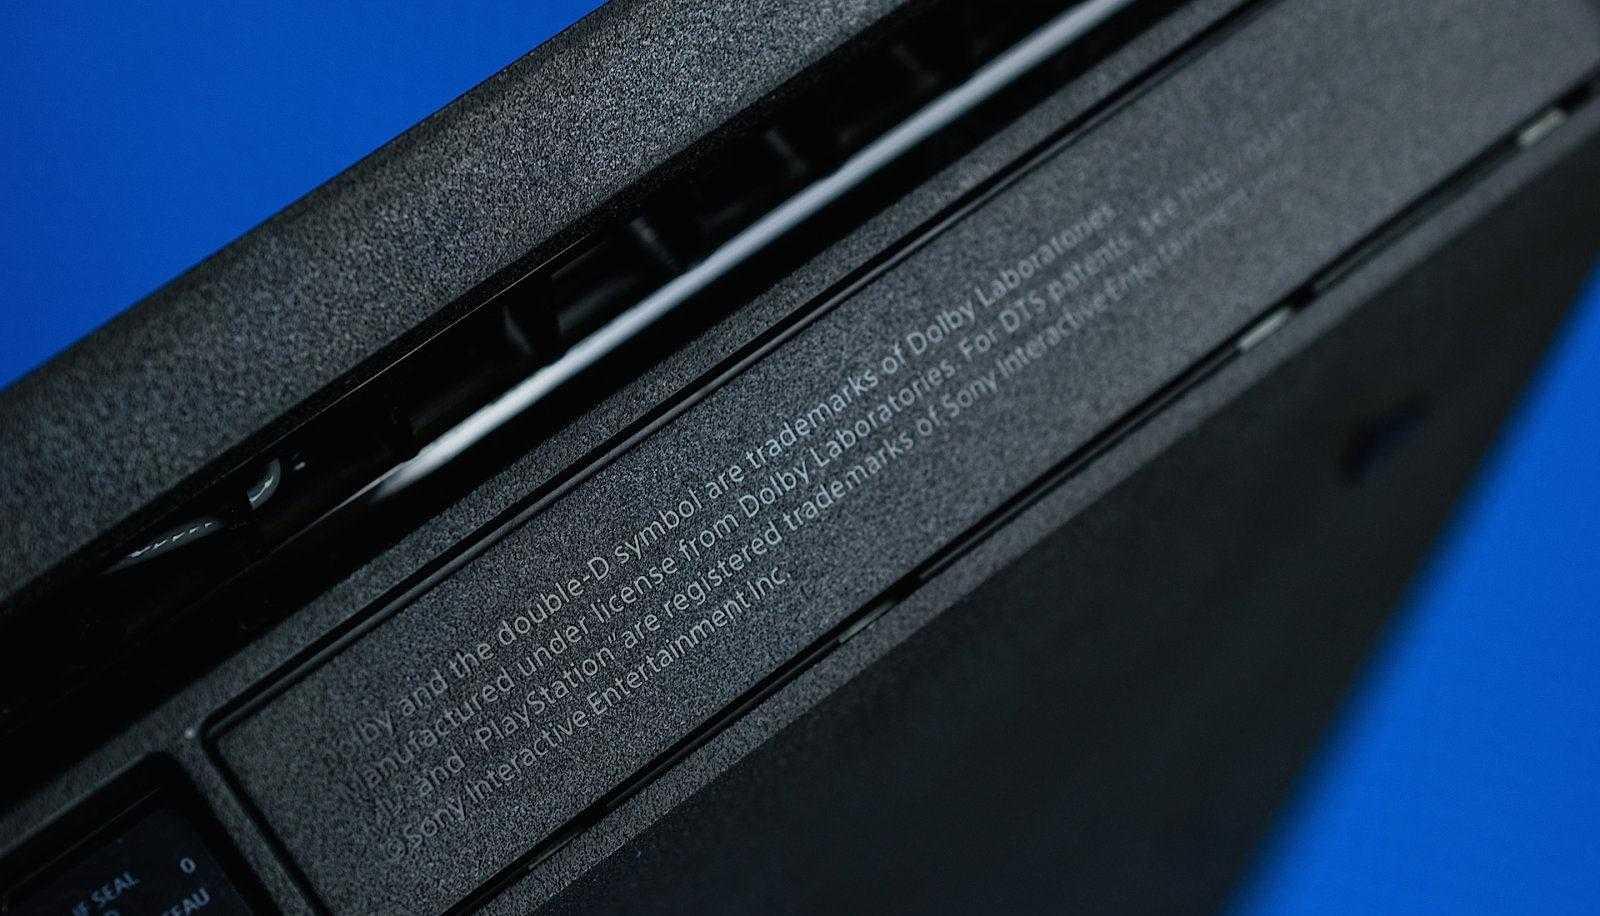 Меньше – не значит хуже. Обзор Sony Playstation 4 Slim (anniversary 15 1 e1475089171260)